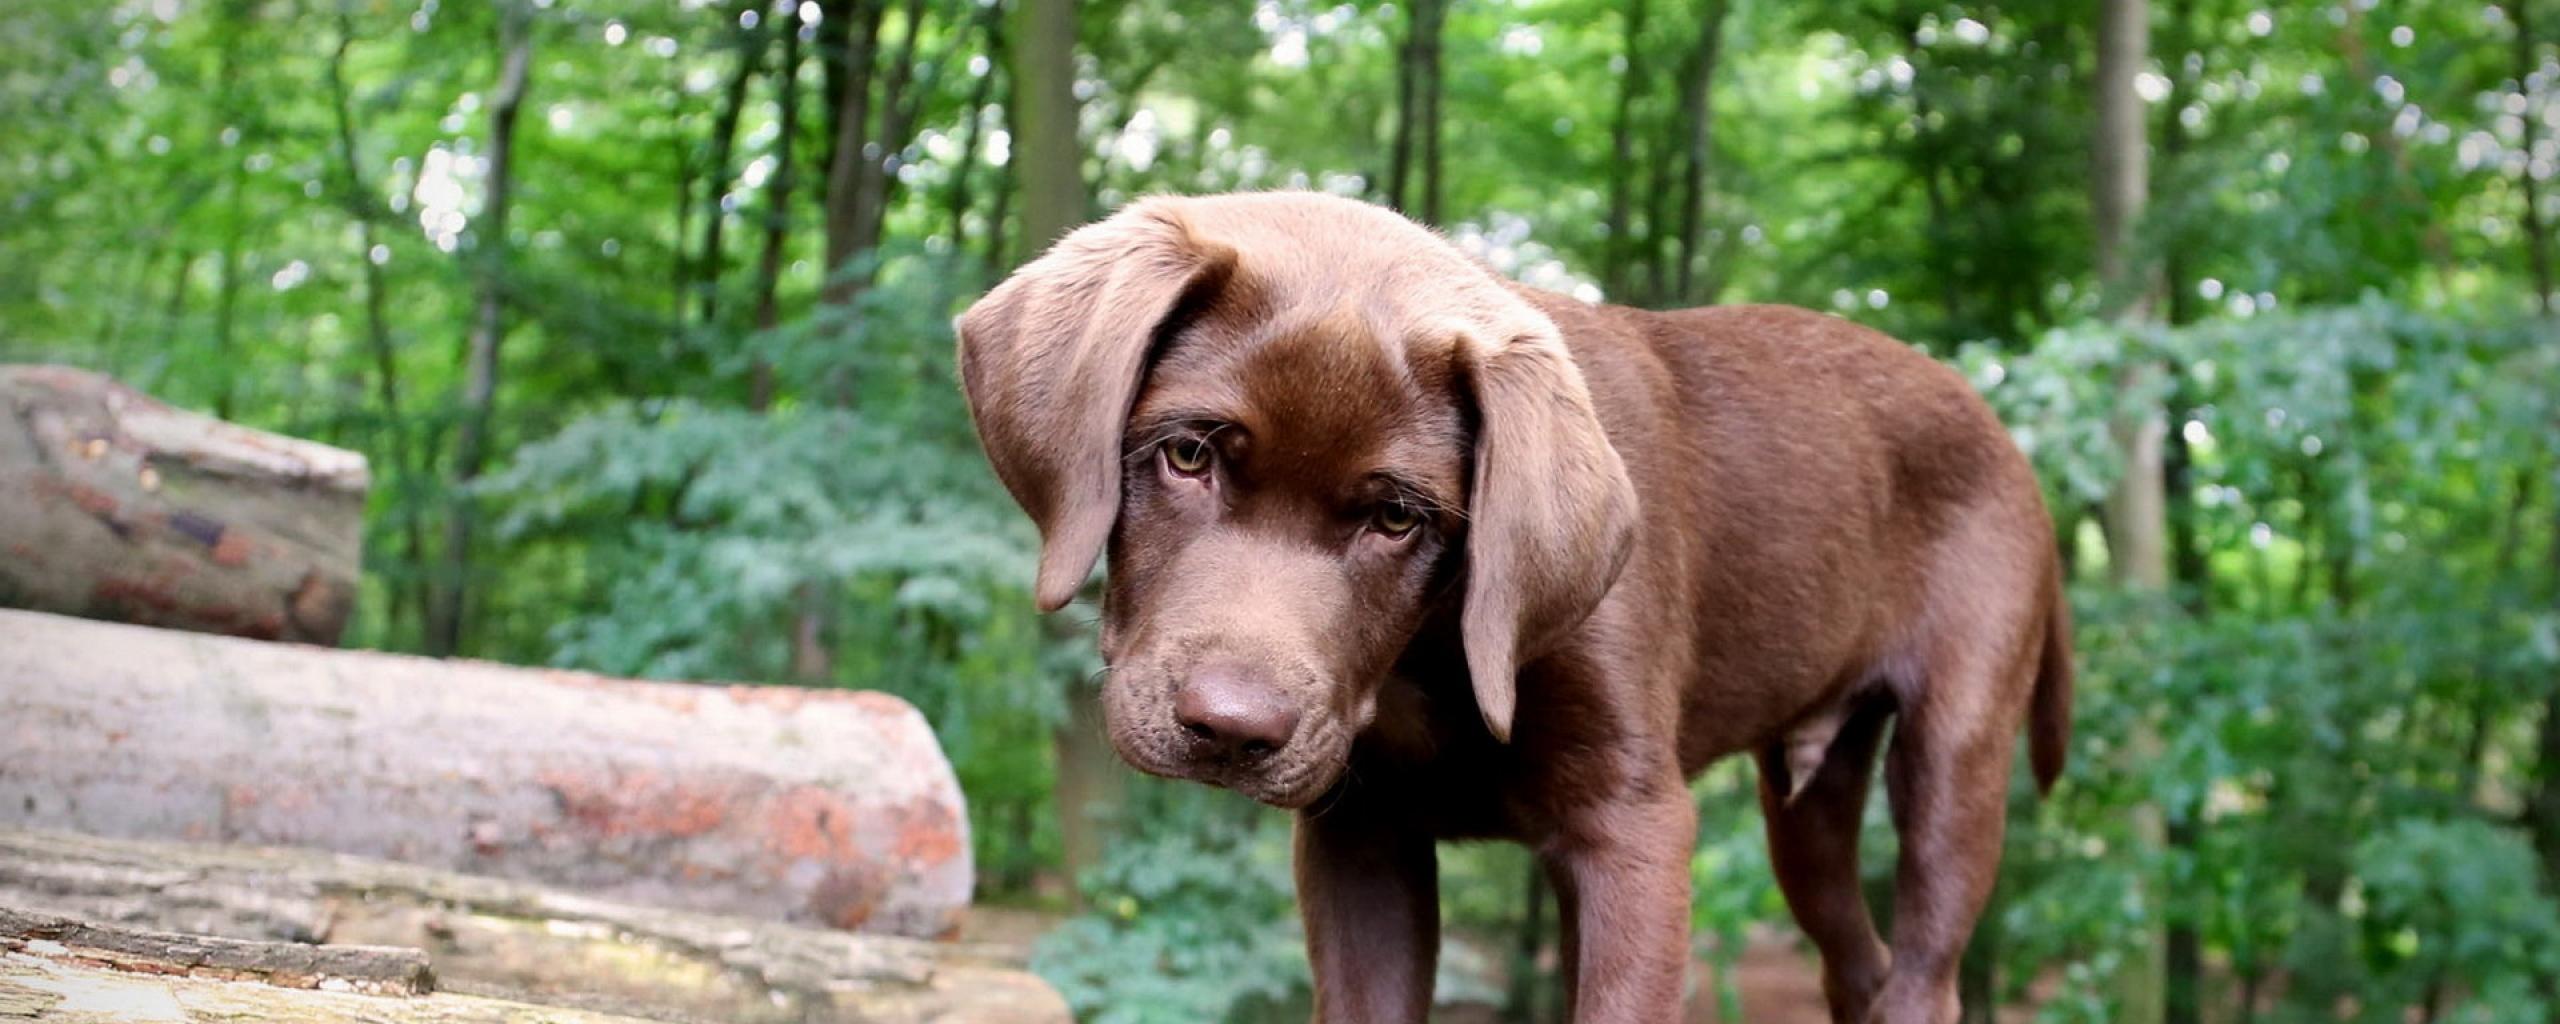 dog_muzzle_ears_beam_puppy_59782_2560x1024